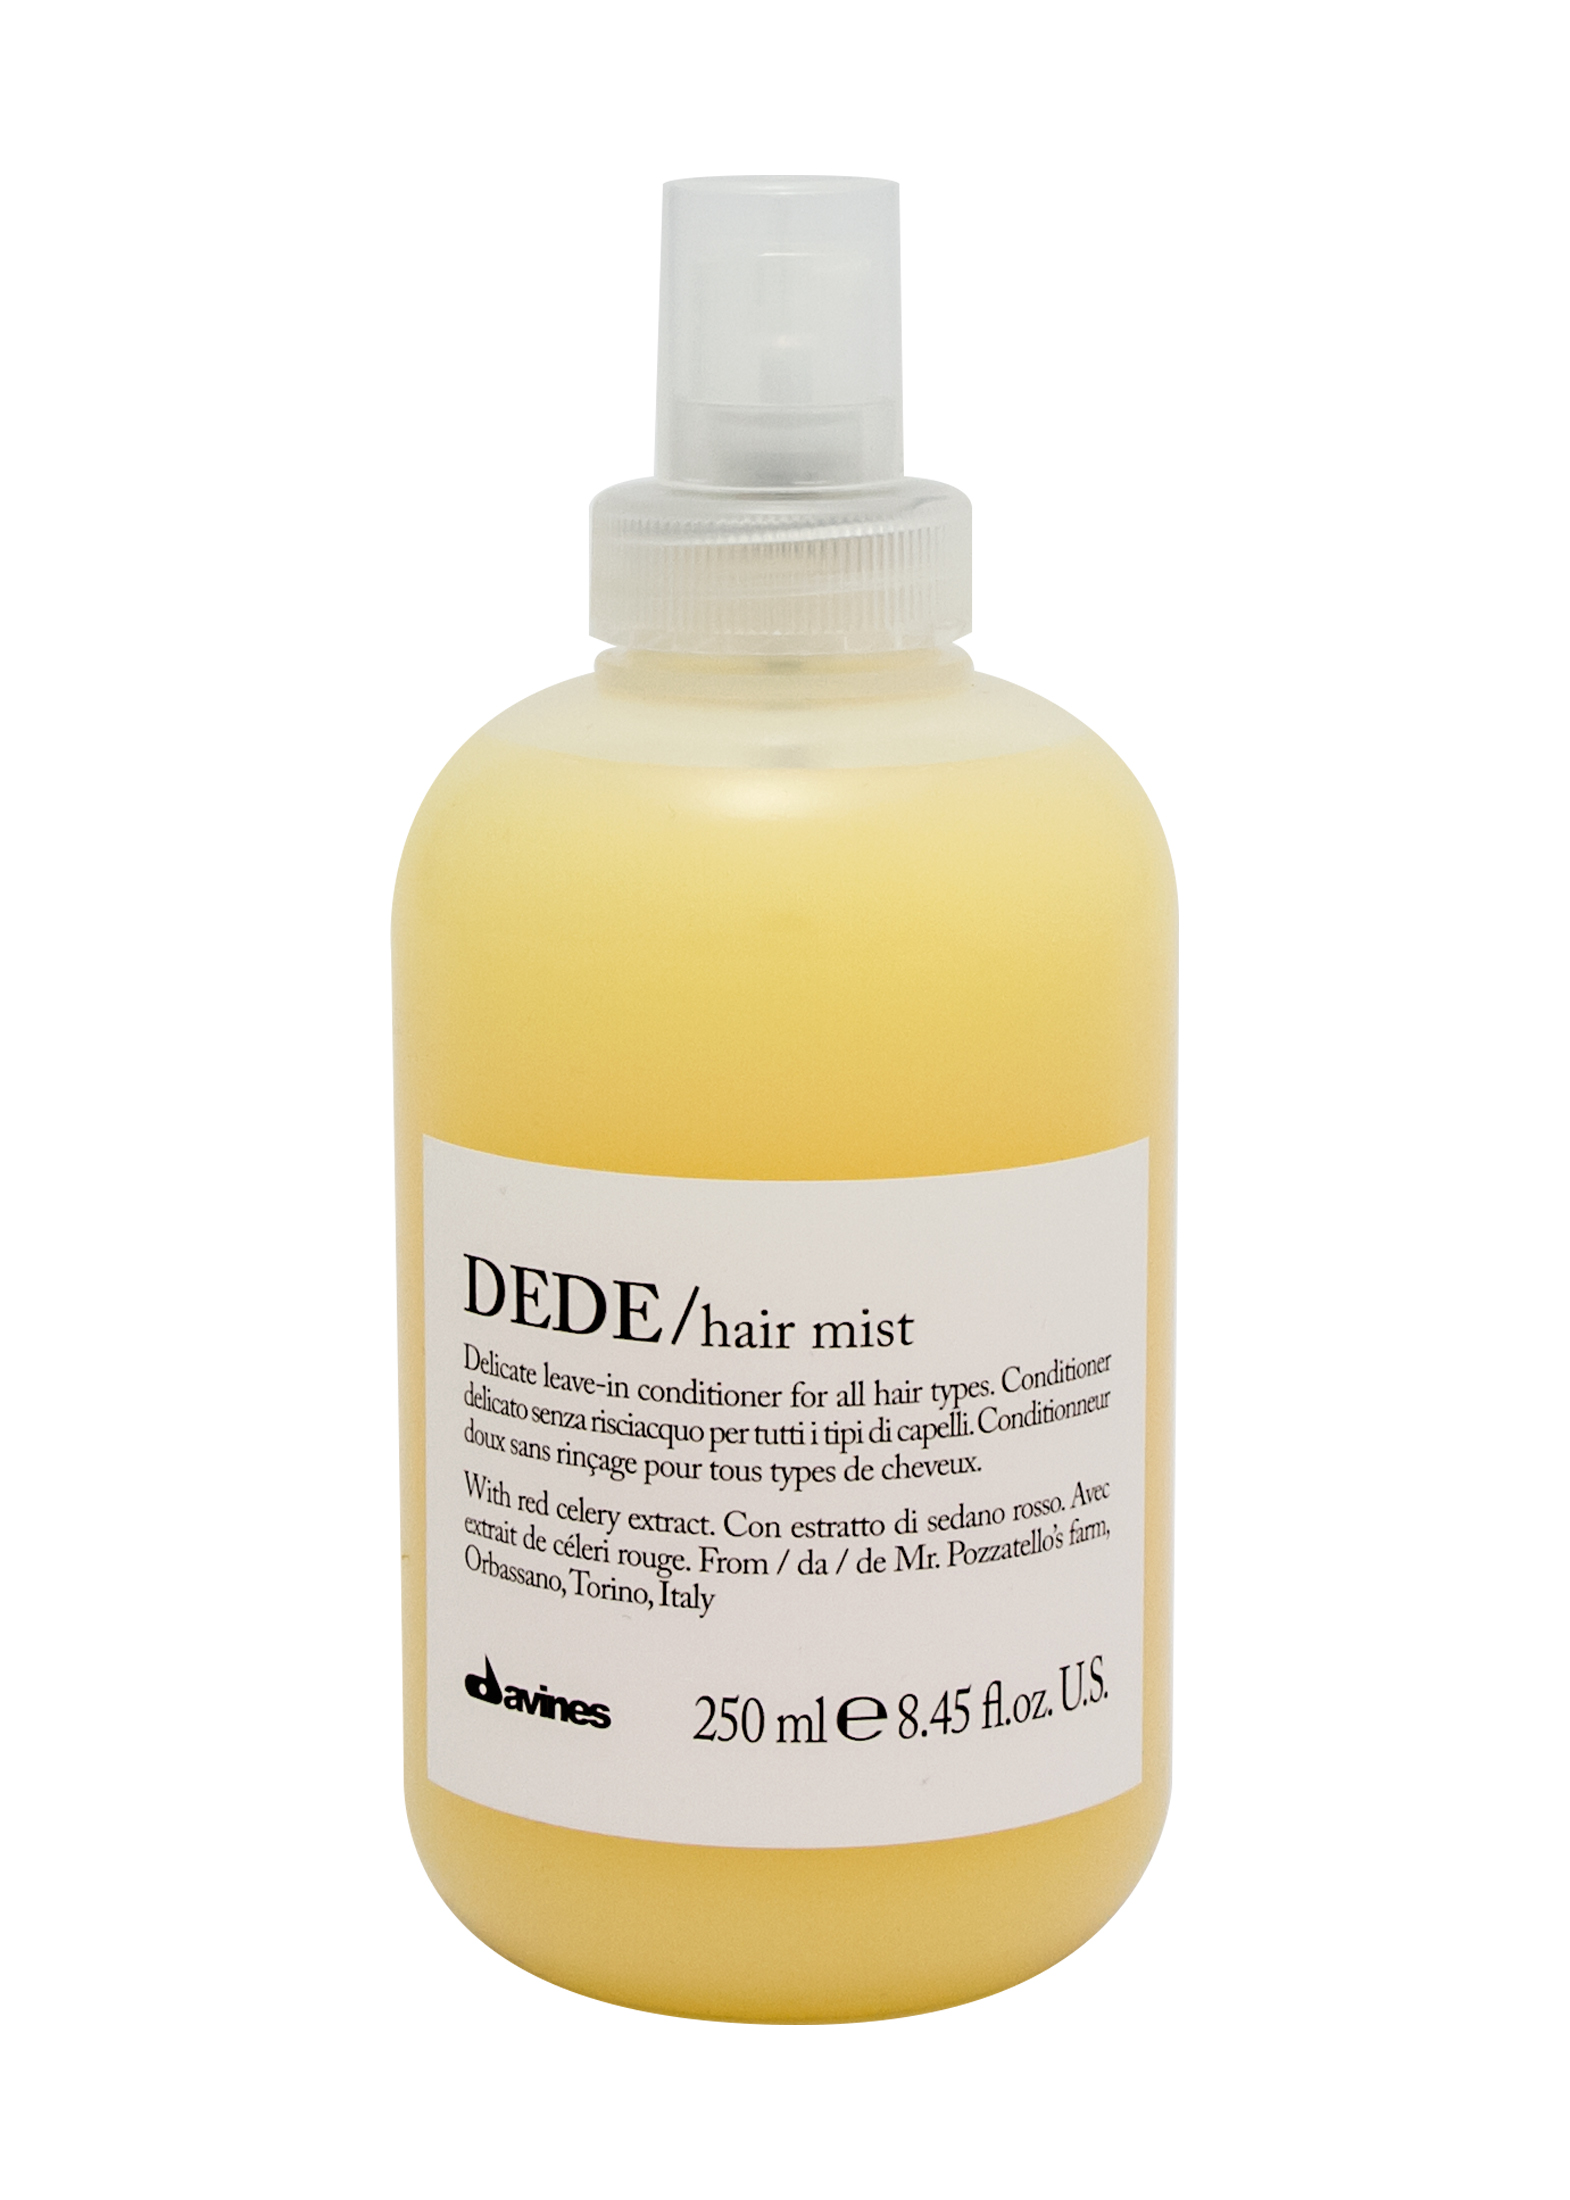 DEHC DEDE Hair Mist 250ml image number 0